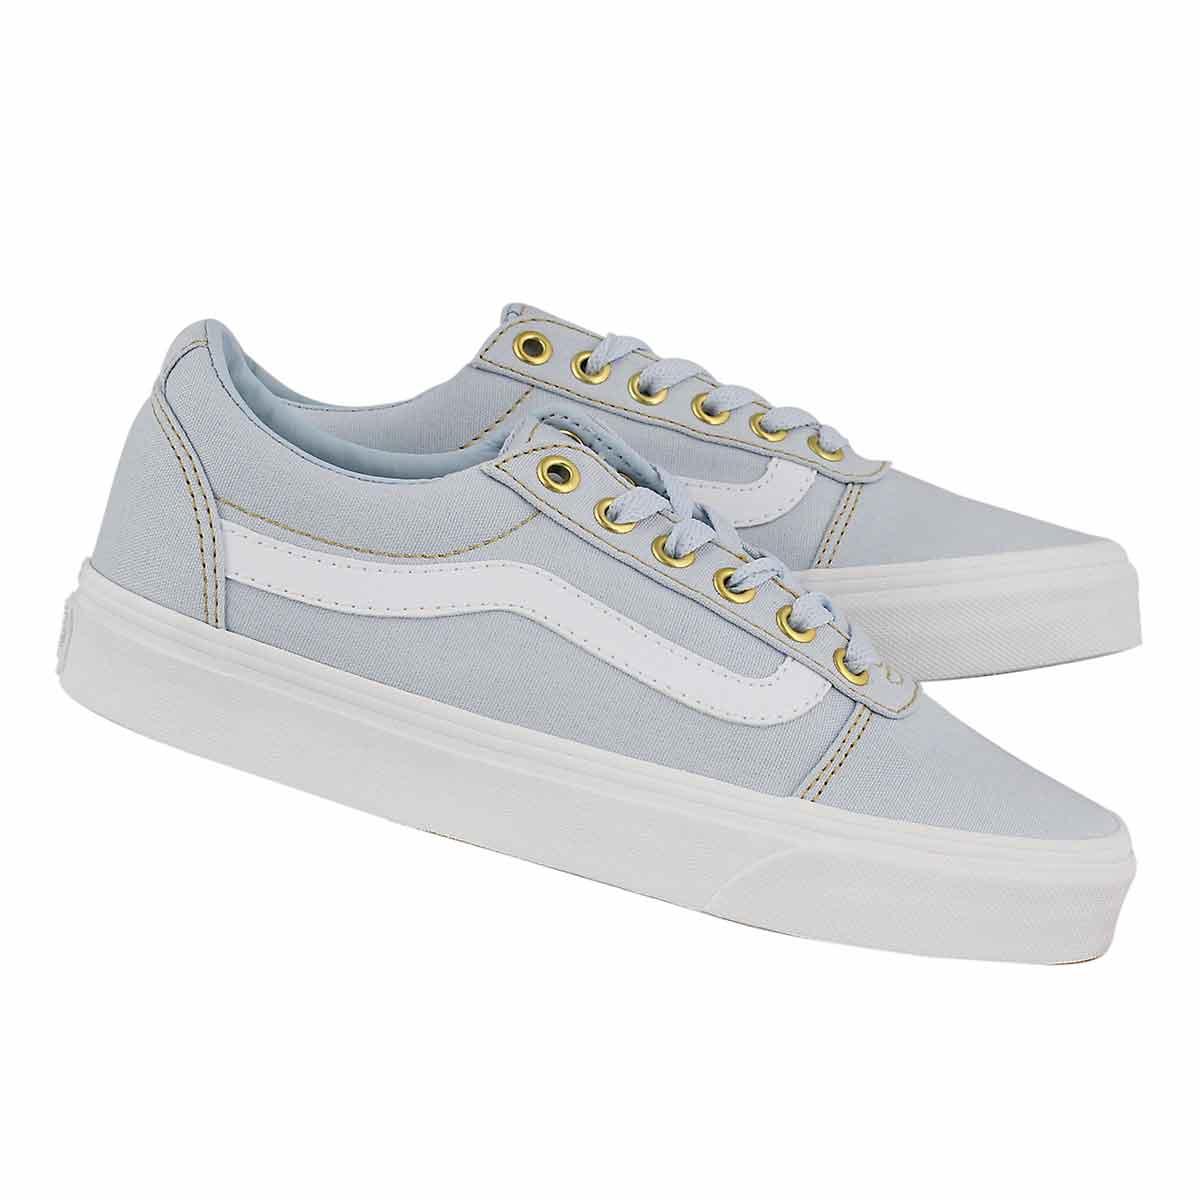 Lds Ward powder blue lace up sneaker